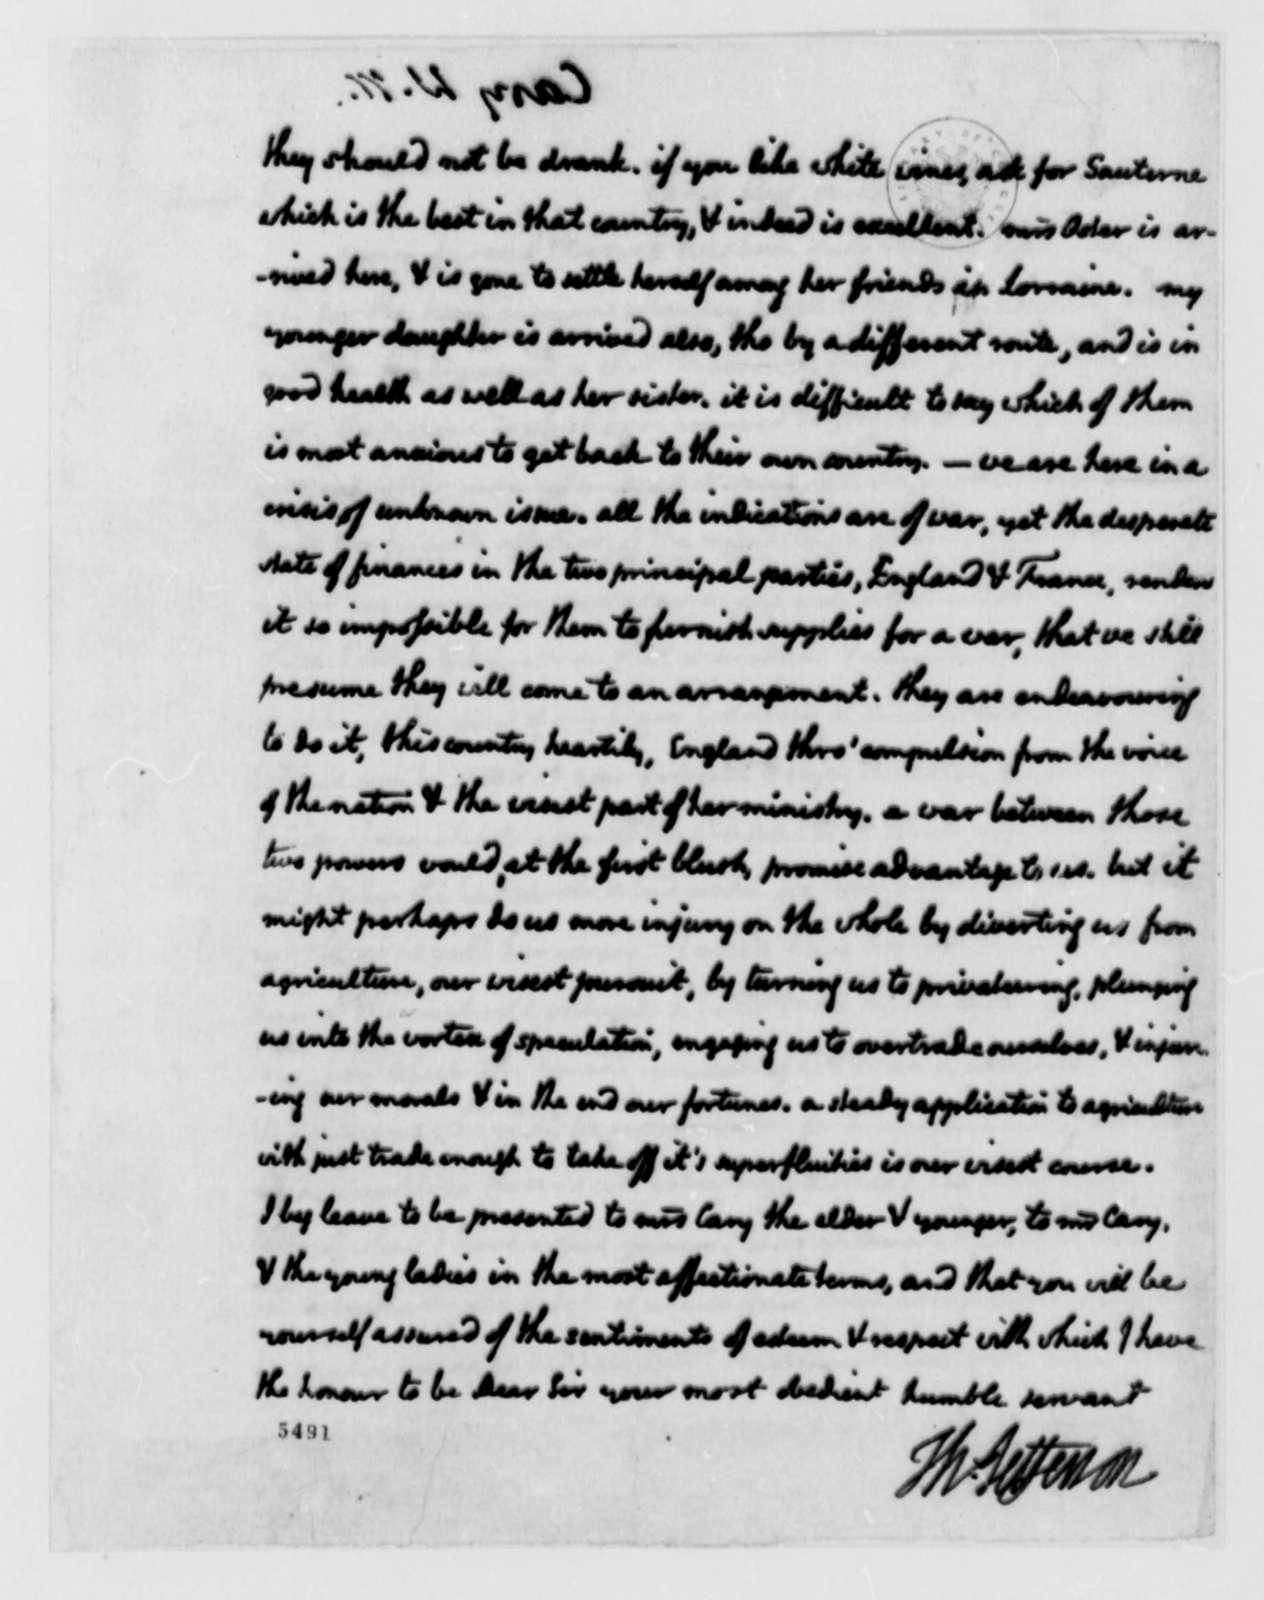 Thomas Jefferson to Wilson Miles Cary, August 12, 1787